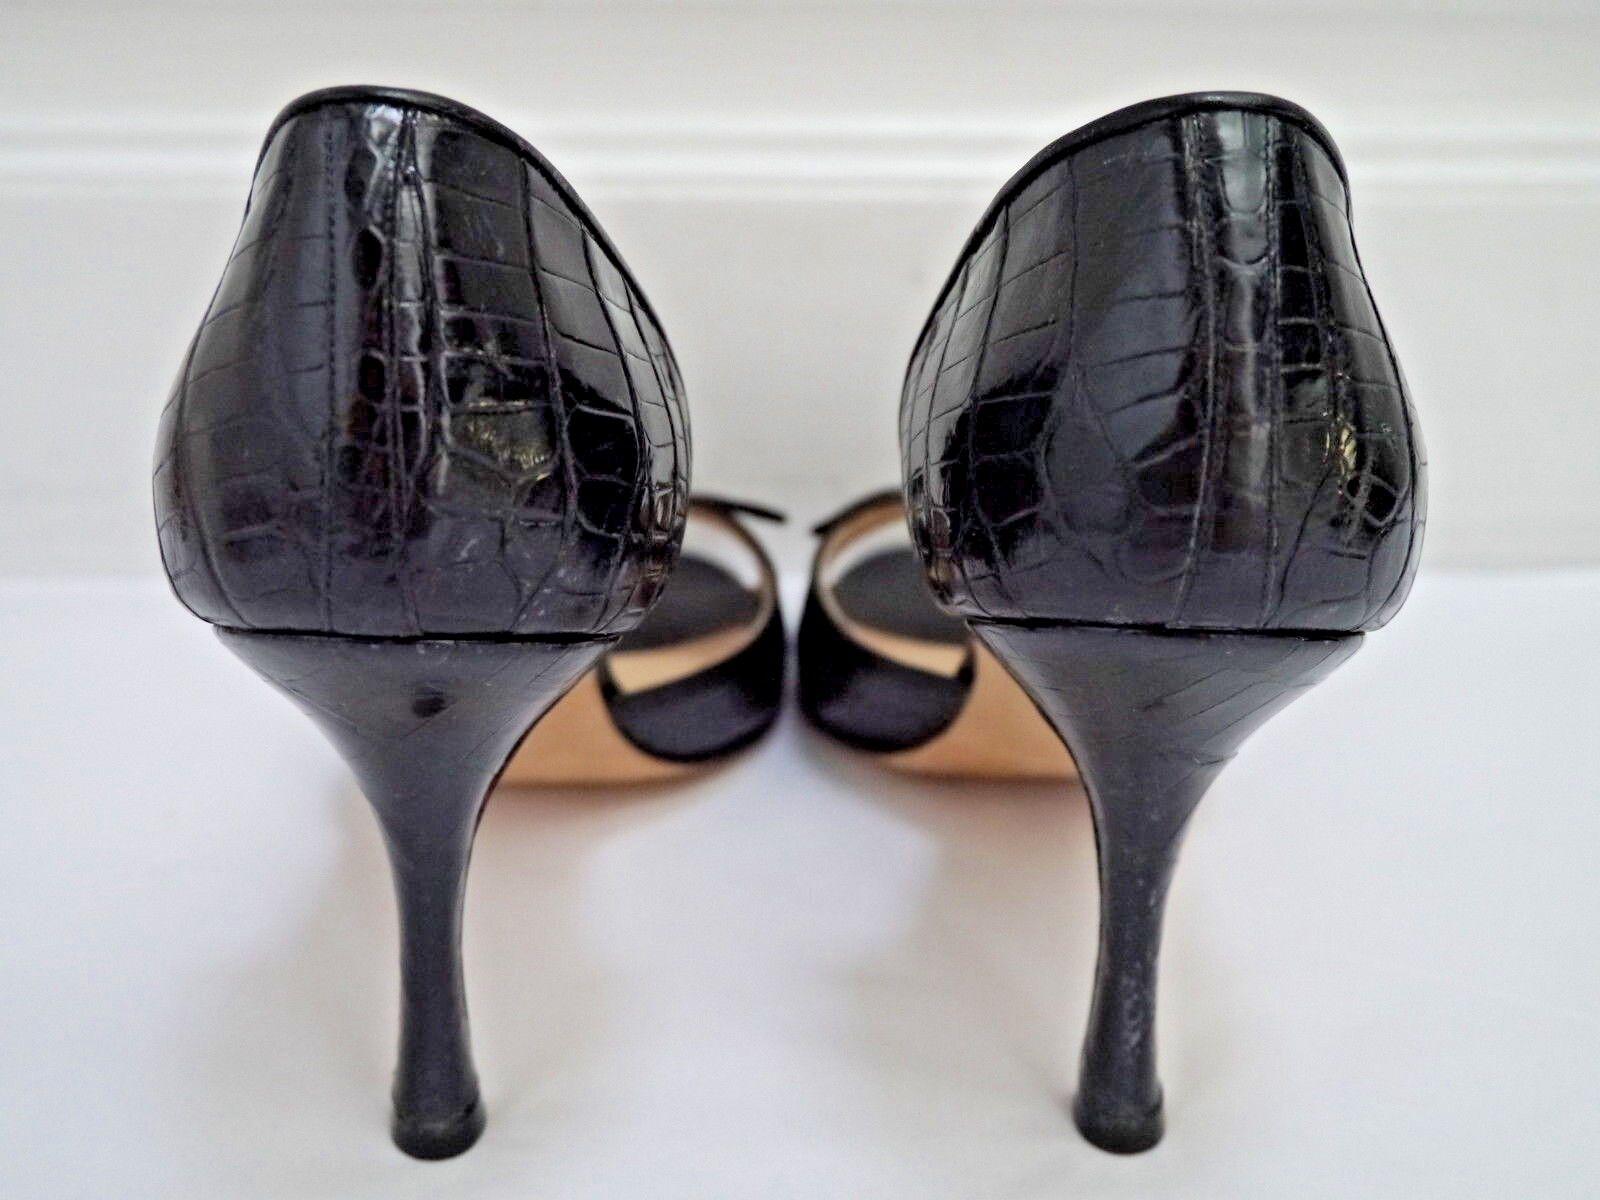 NEW MANOLO BLAHNIK  2750 2750 2750 black alligator crocodile open-toe heels Italian 38.5 fdafcc